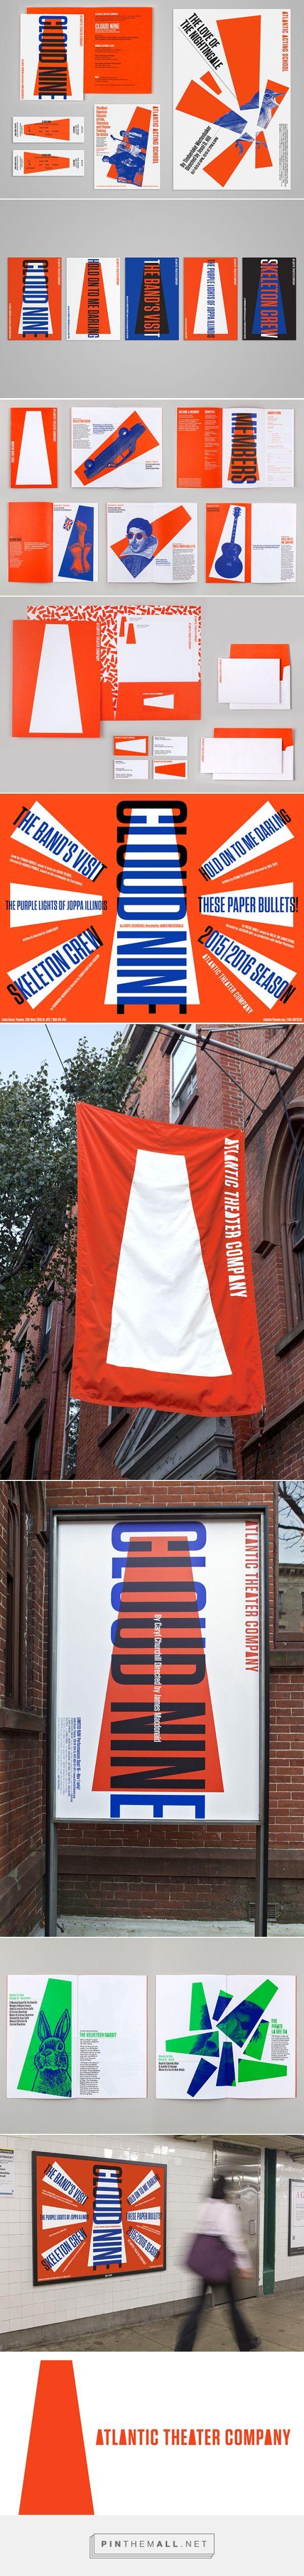 Paula Scher (Pentagram) designs bold new identity for New York's Atlantic Theater Company